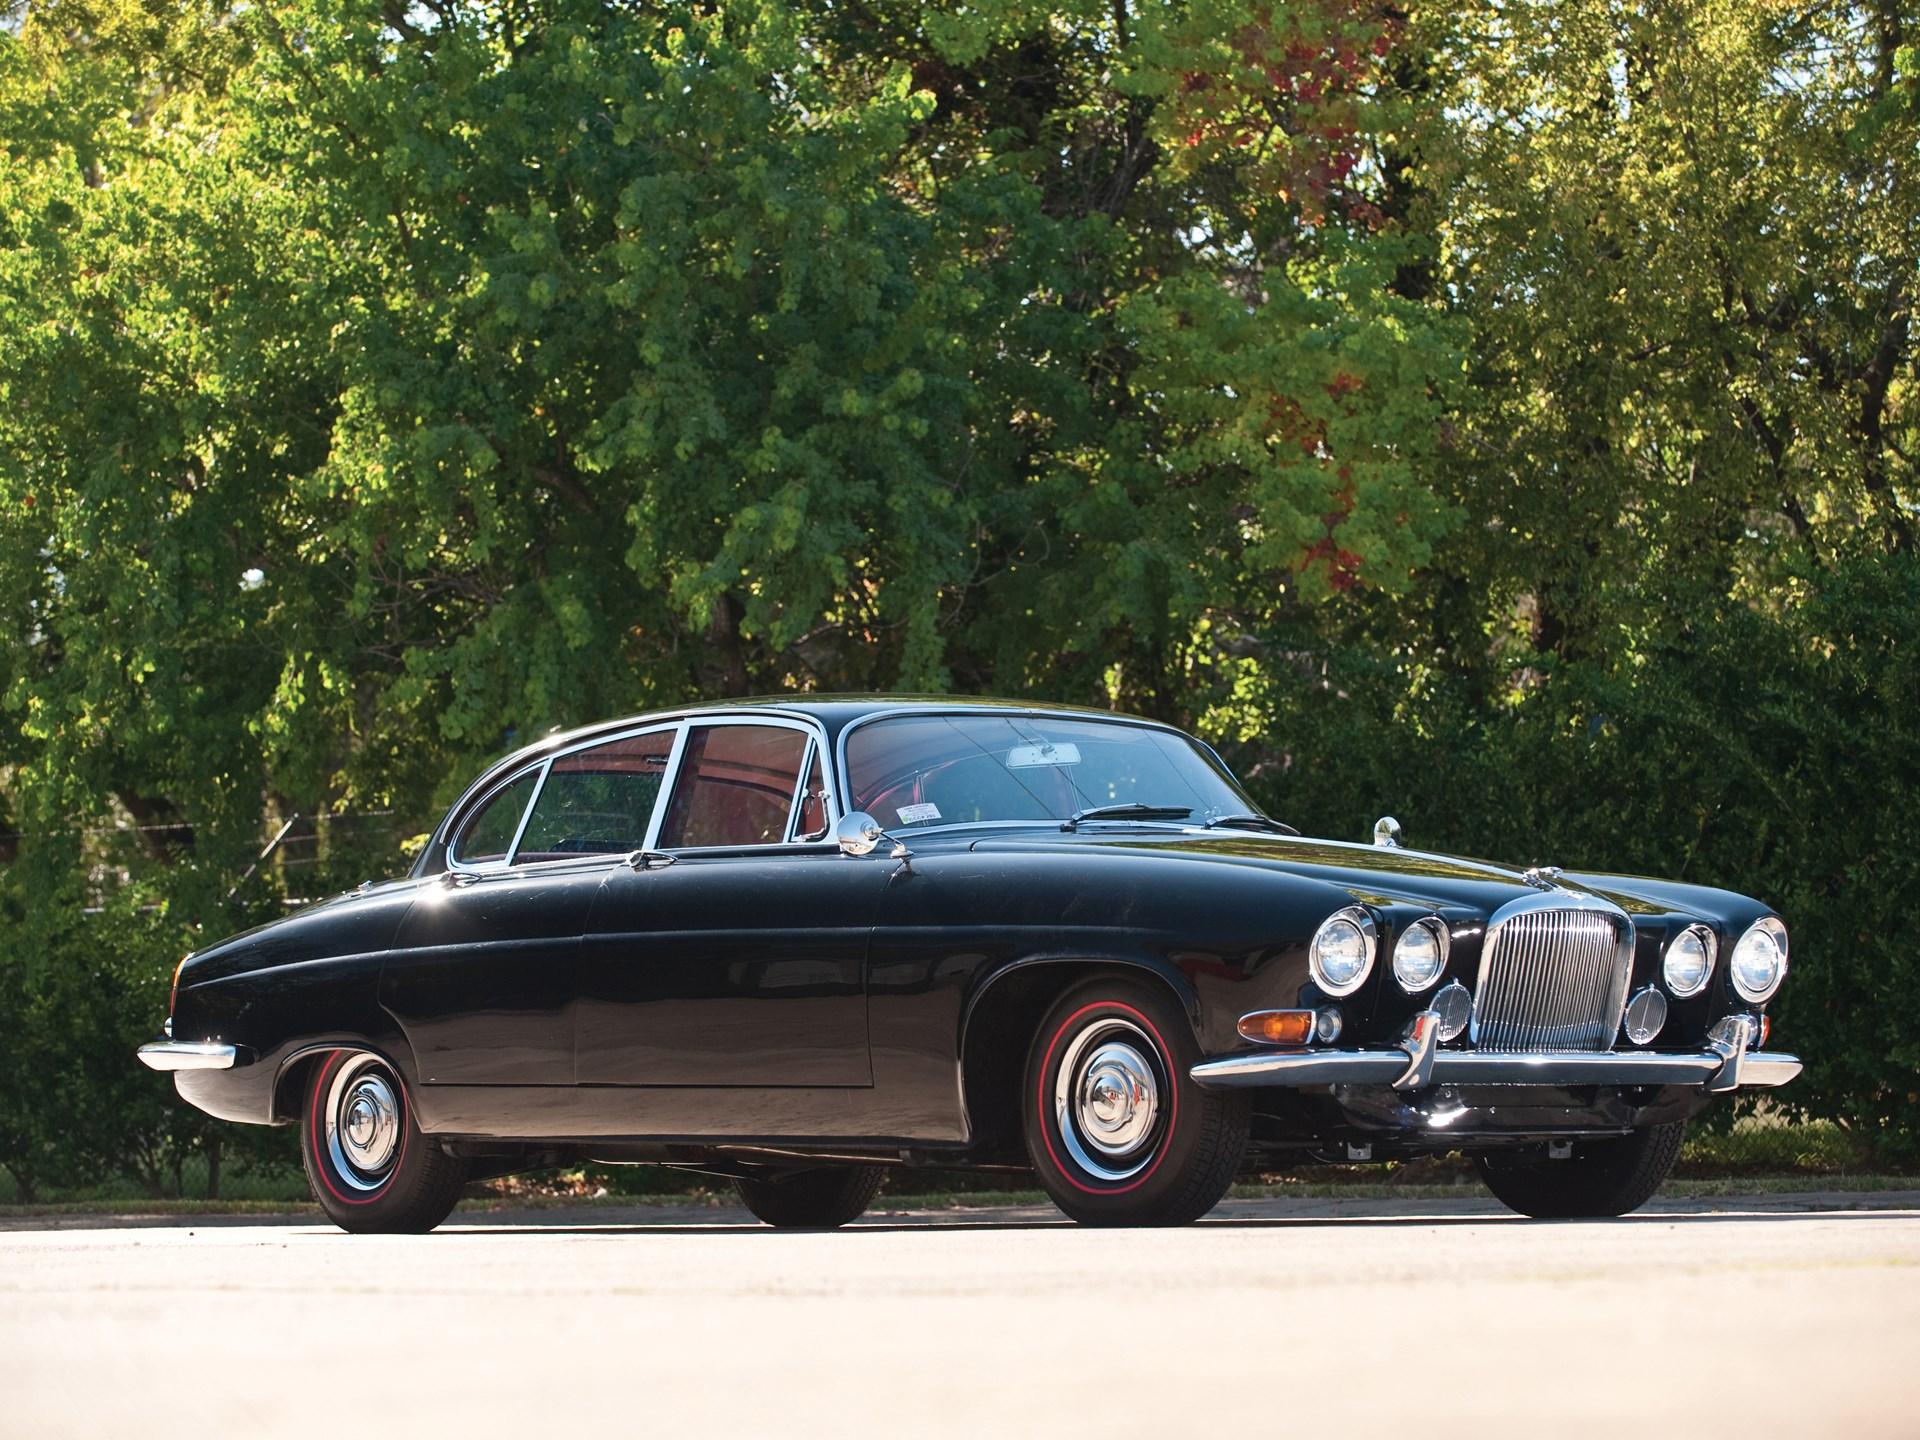 1964 Jaguar Mark X Sedan front 3/4